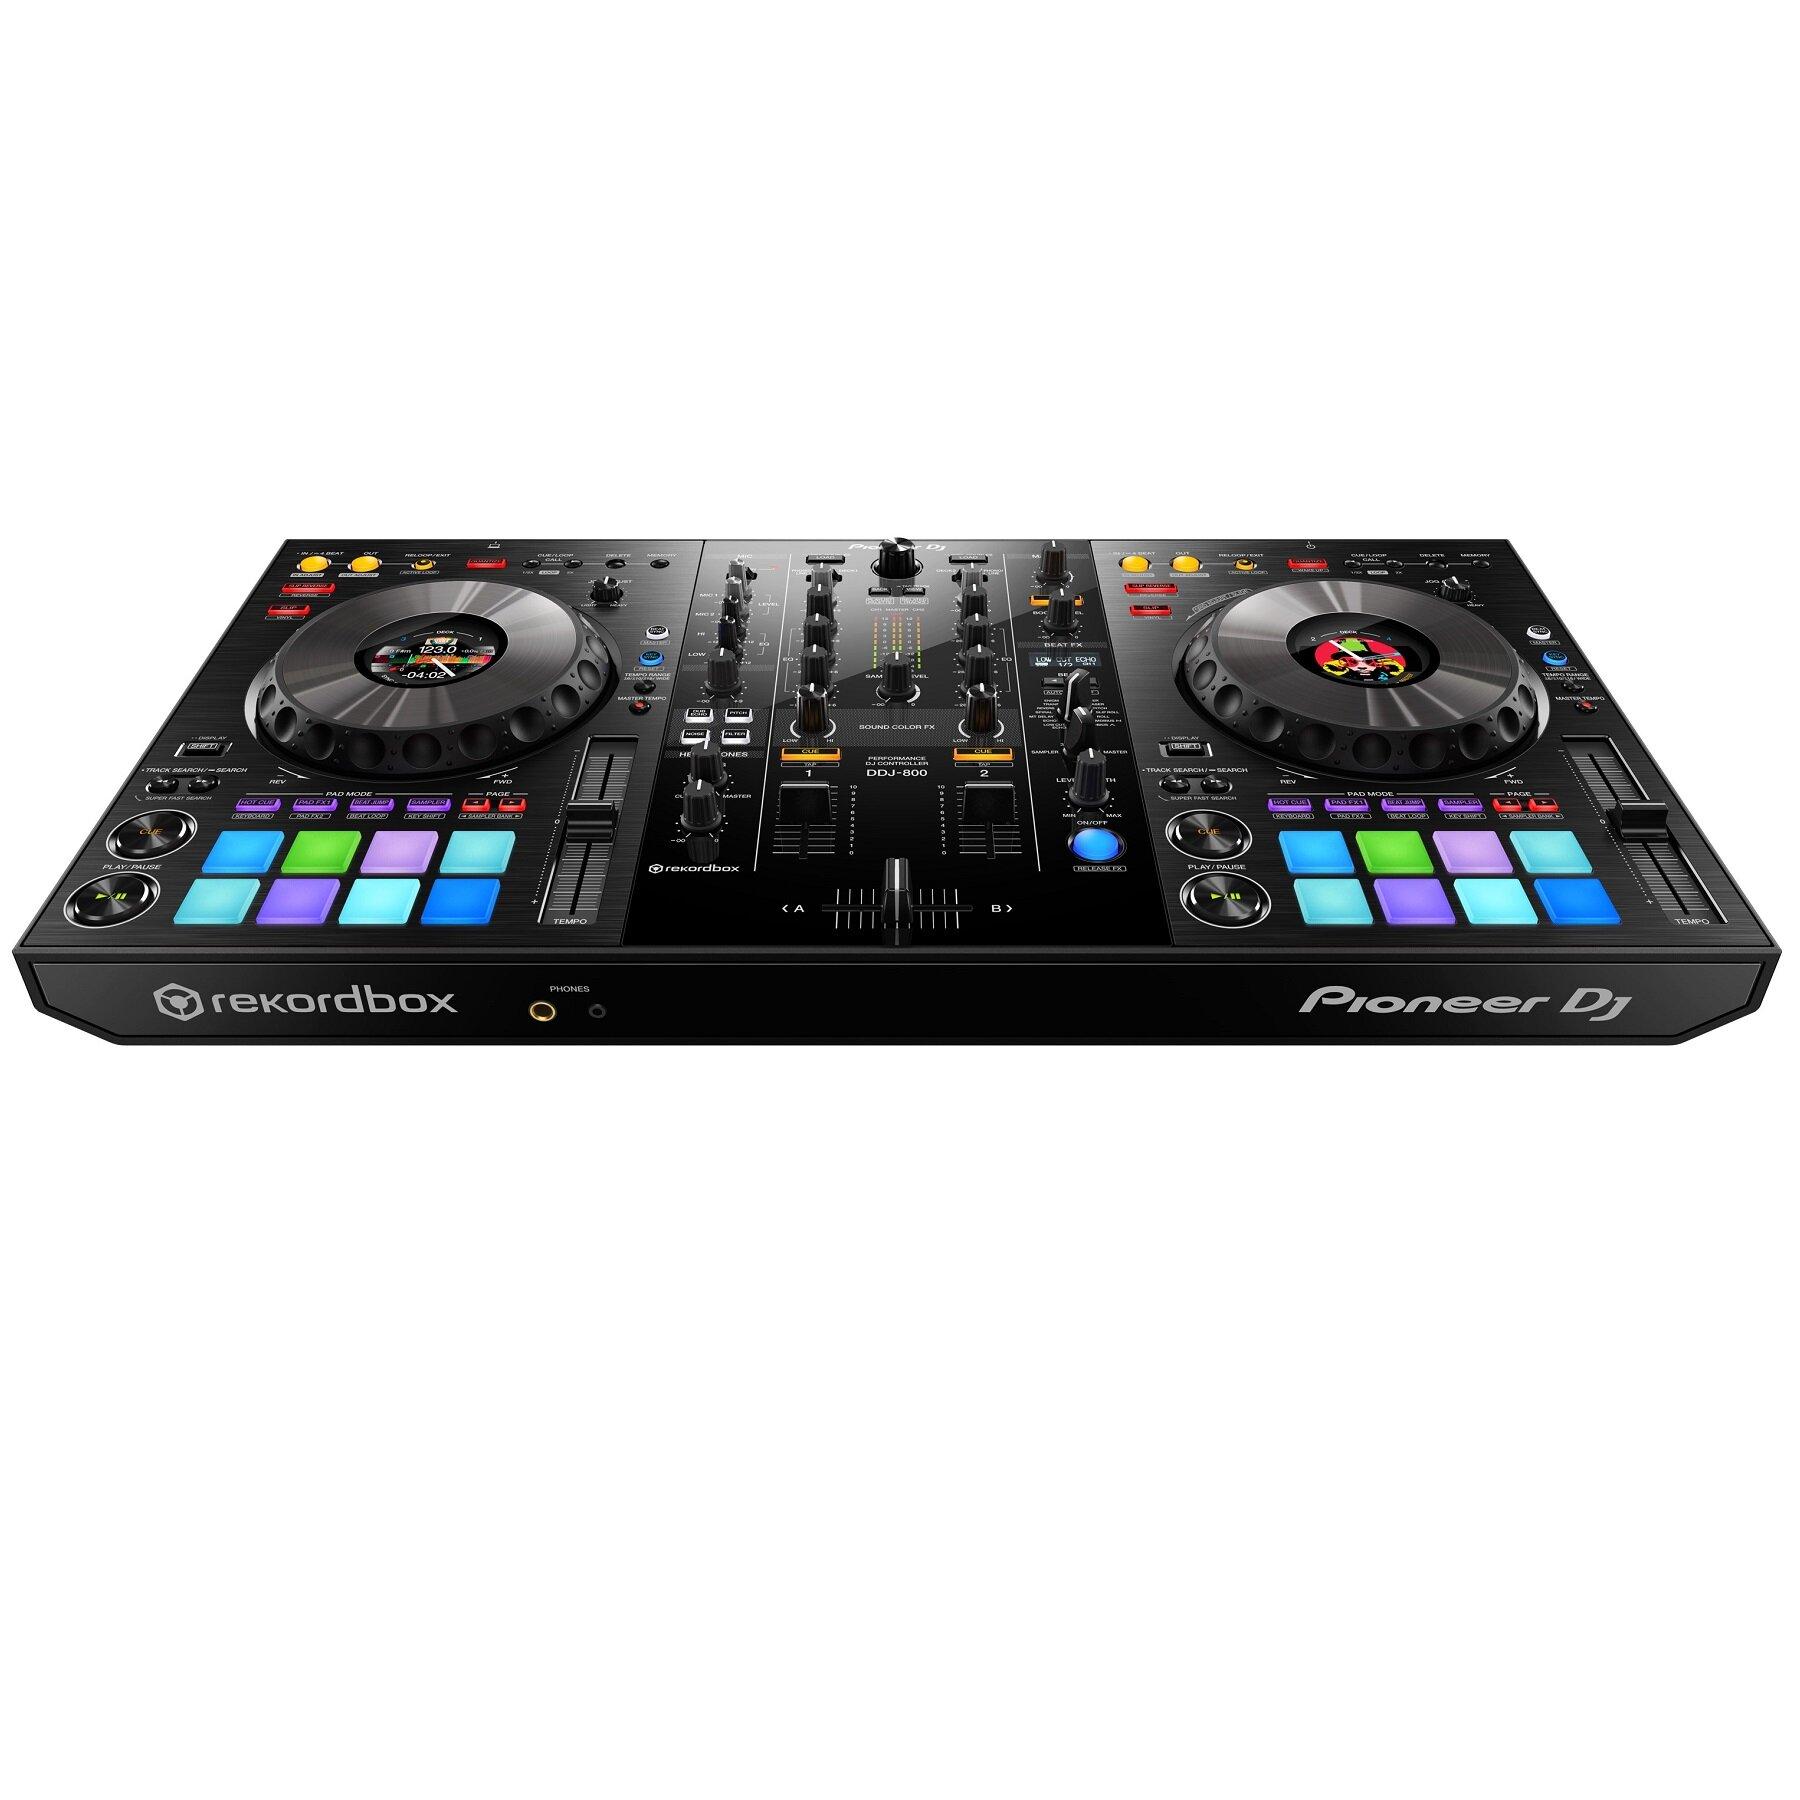 DJ станции, комплекты, контроллеры Pioneer DDJ-800